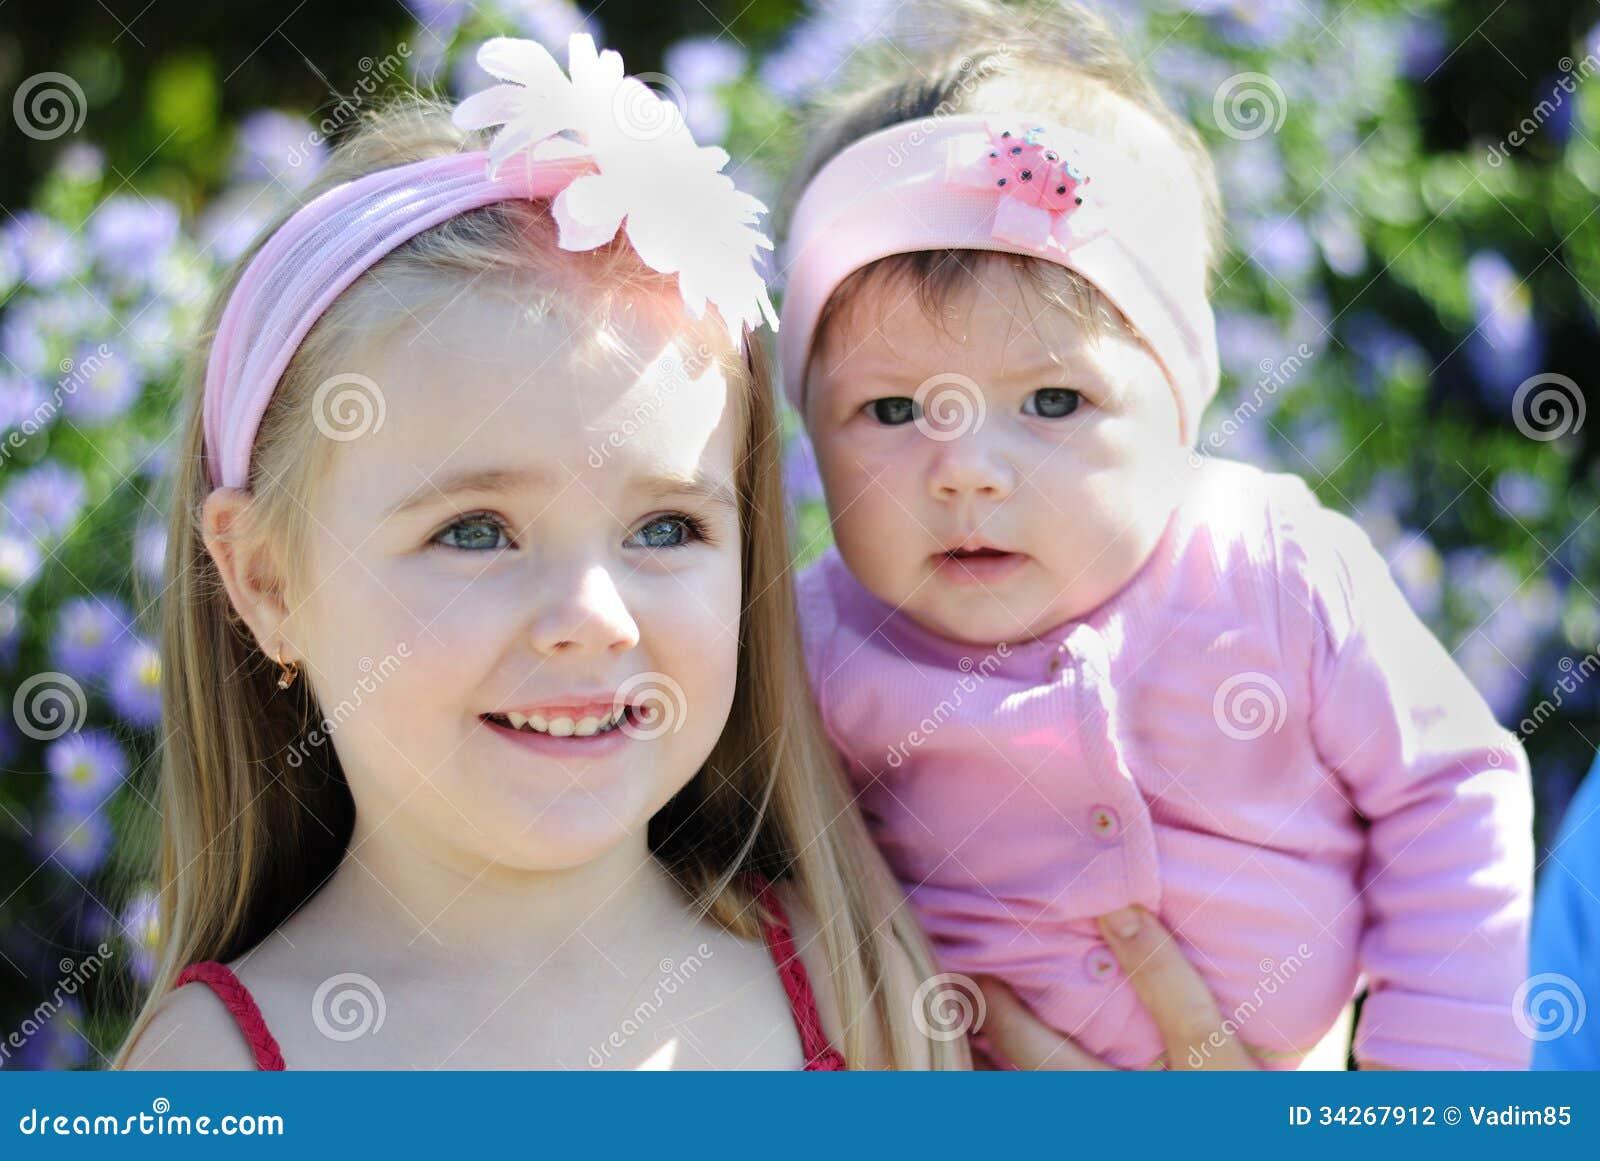 Two beautiful girls near a flower stock photo image of children two beautiful girls near a flower izmirmasajfo